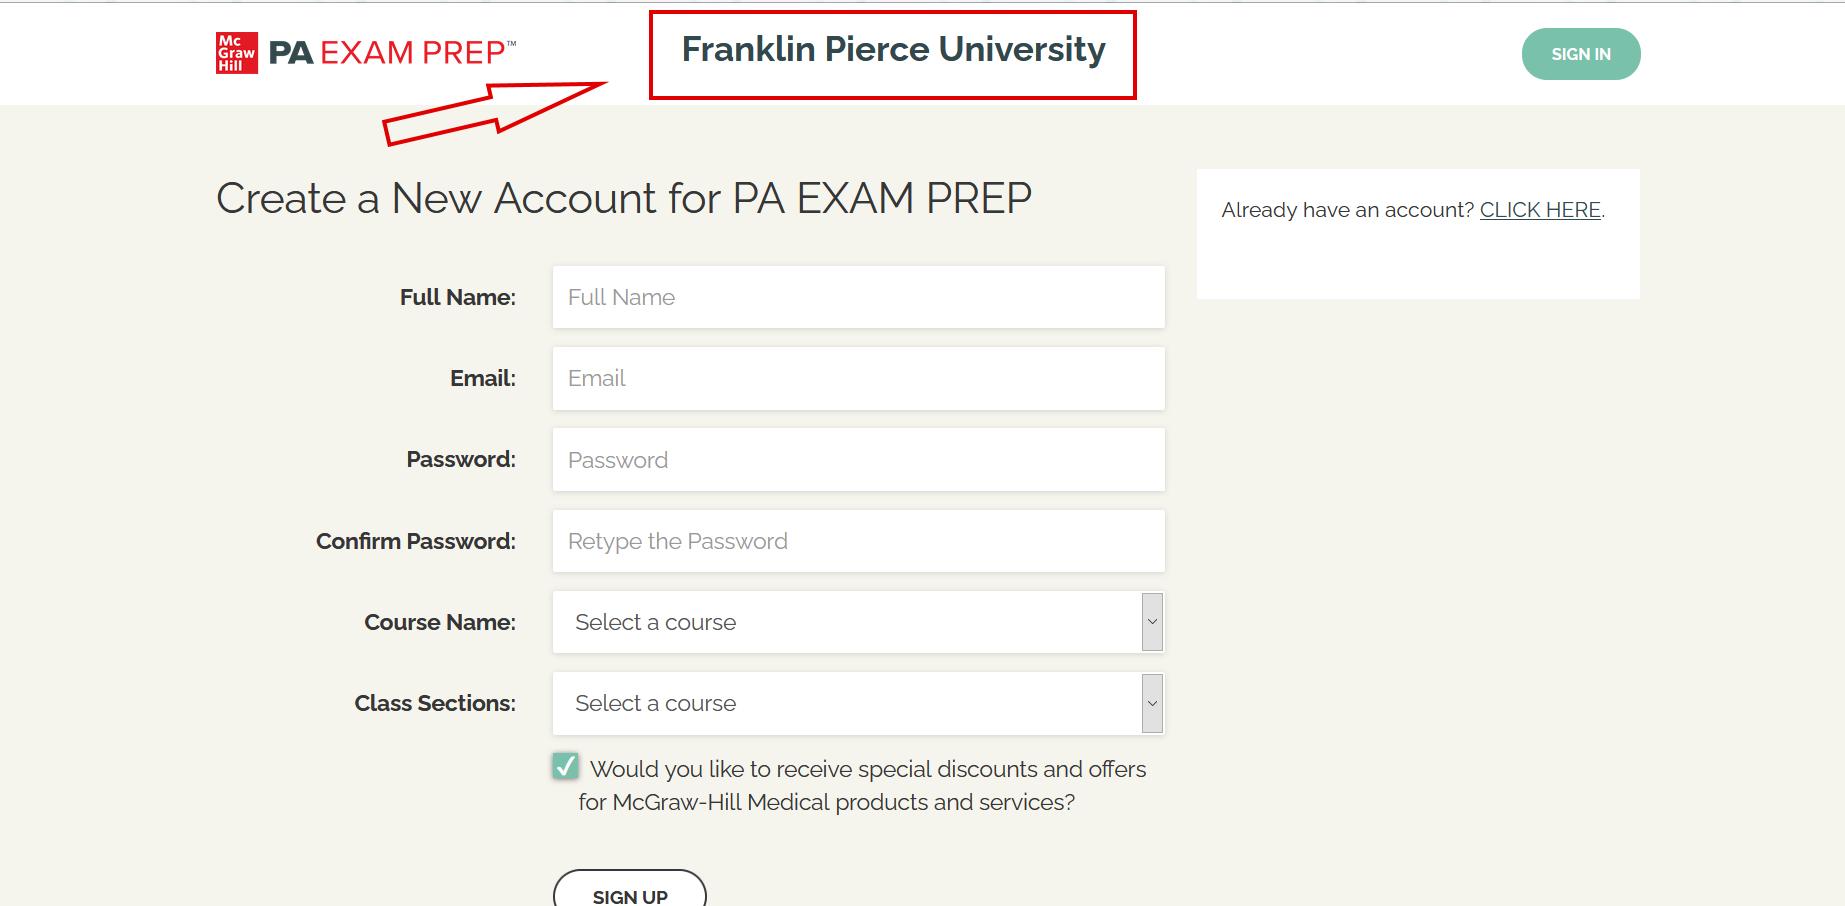 PA Exam Prep Account Creation Screen